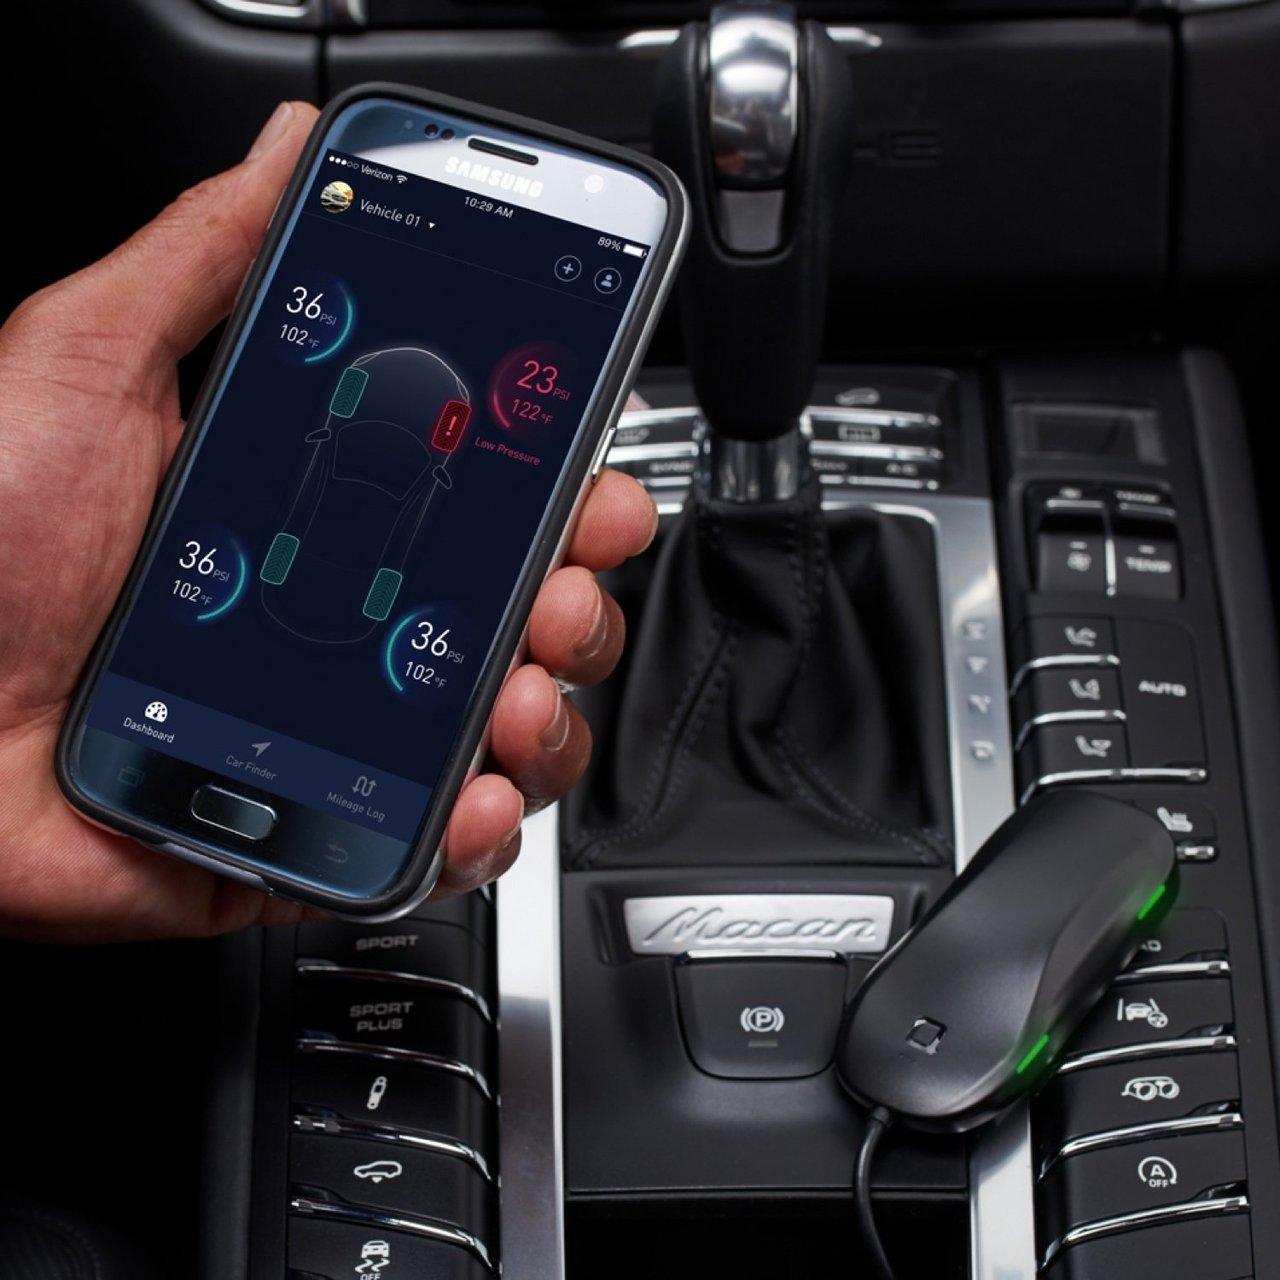 nonda ZUS Smart Tire Safety Monitor System